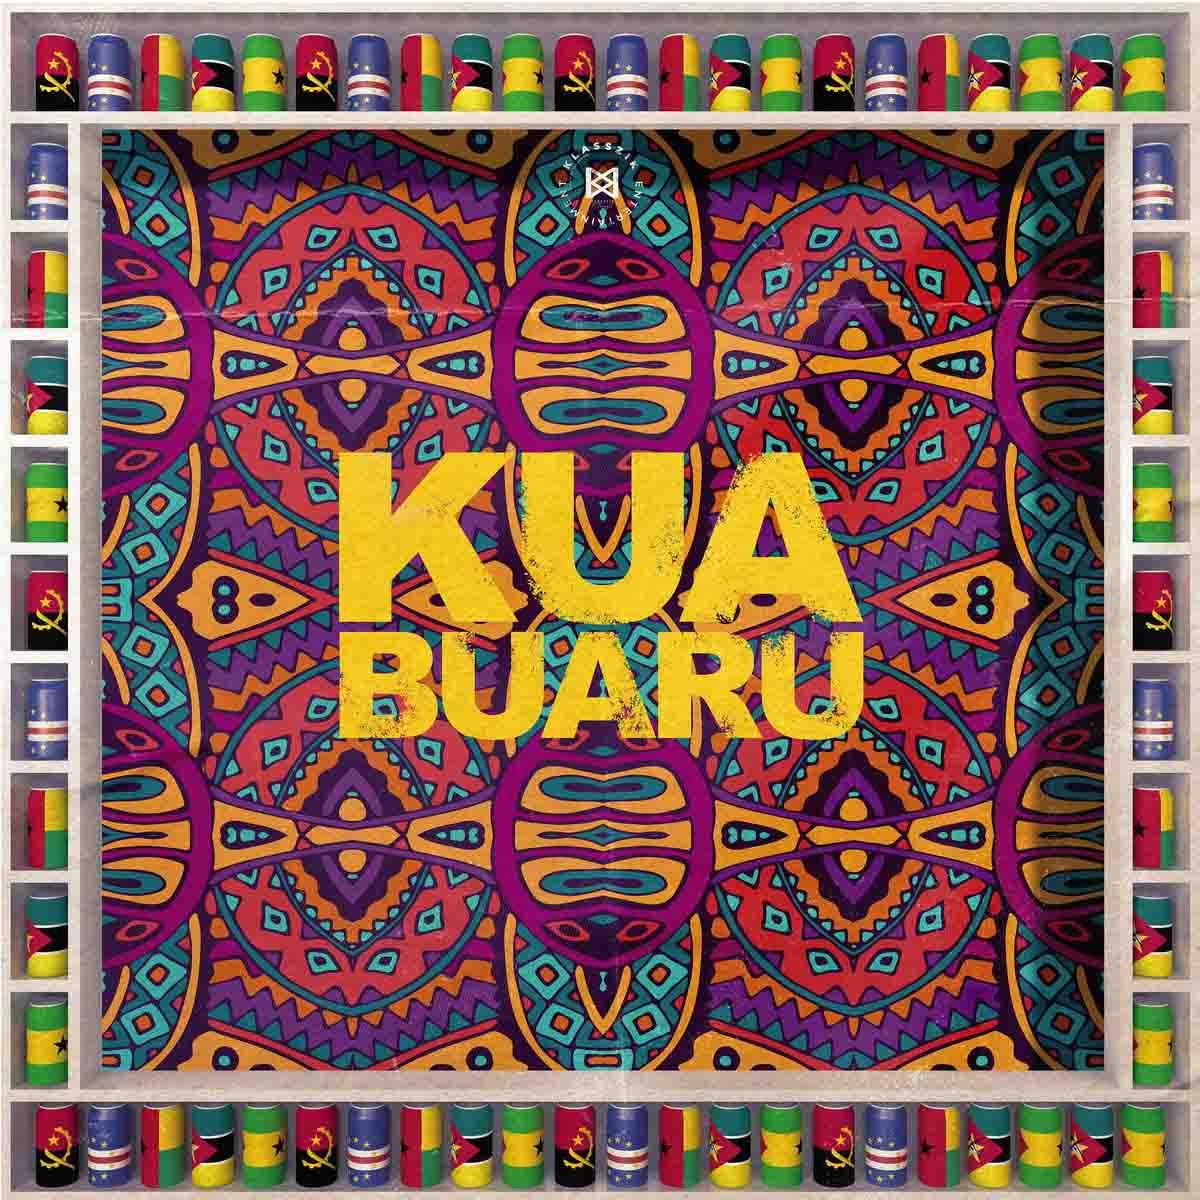 Calema - Kua Buaru (feat. Soraia Ramos, Pérola & Manecas Costa)